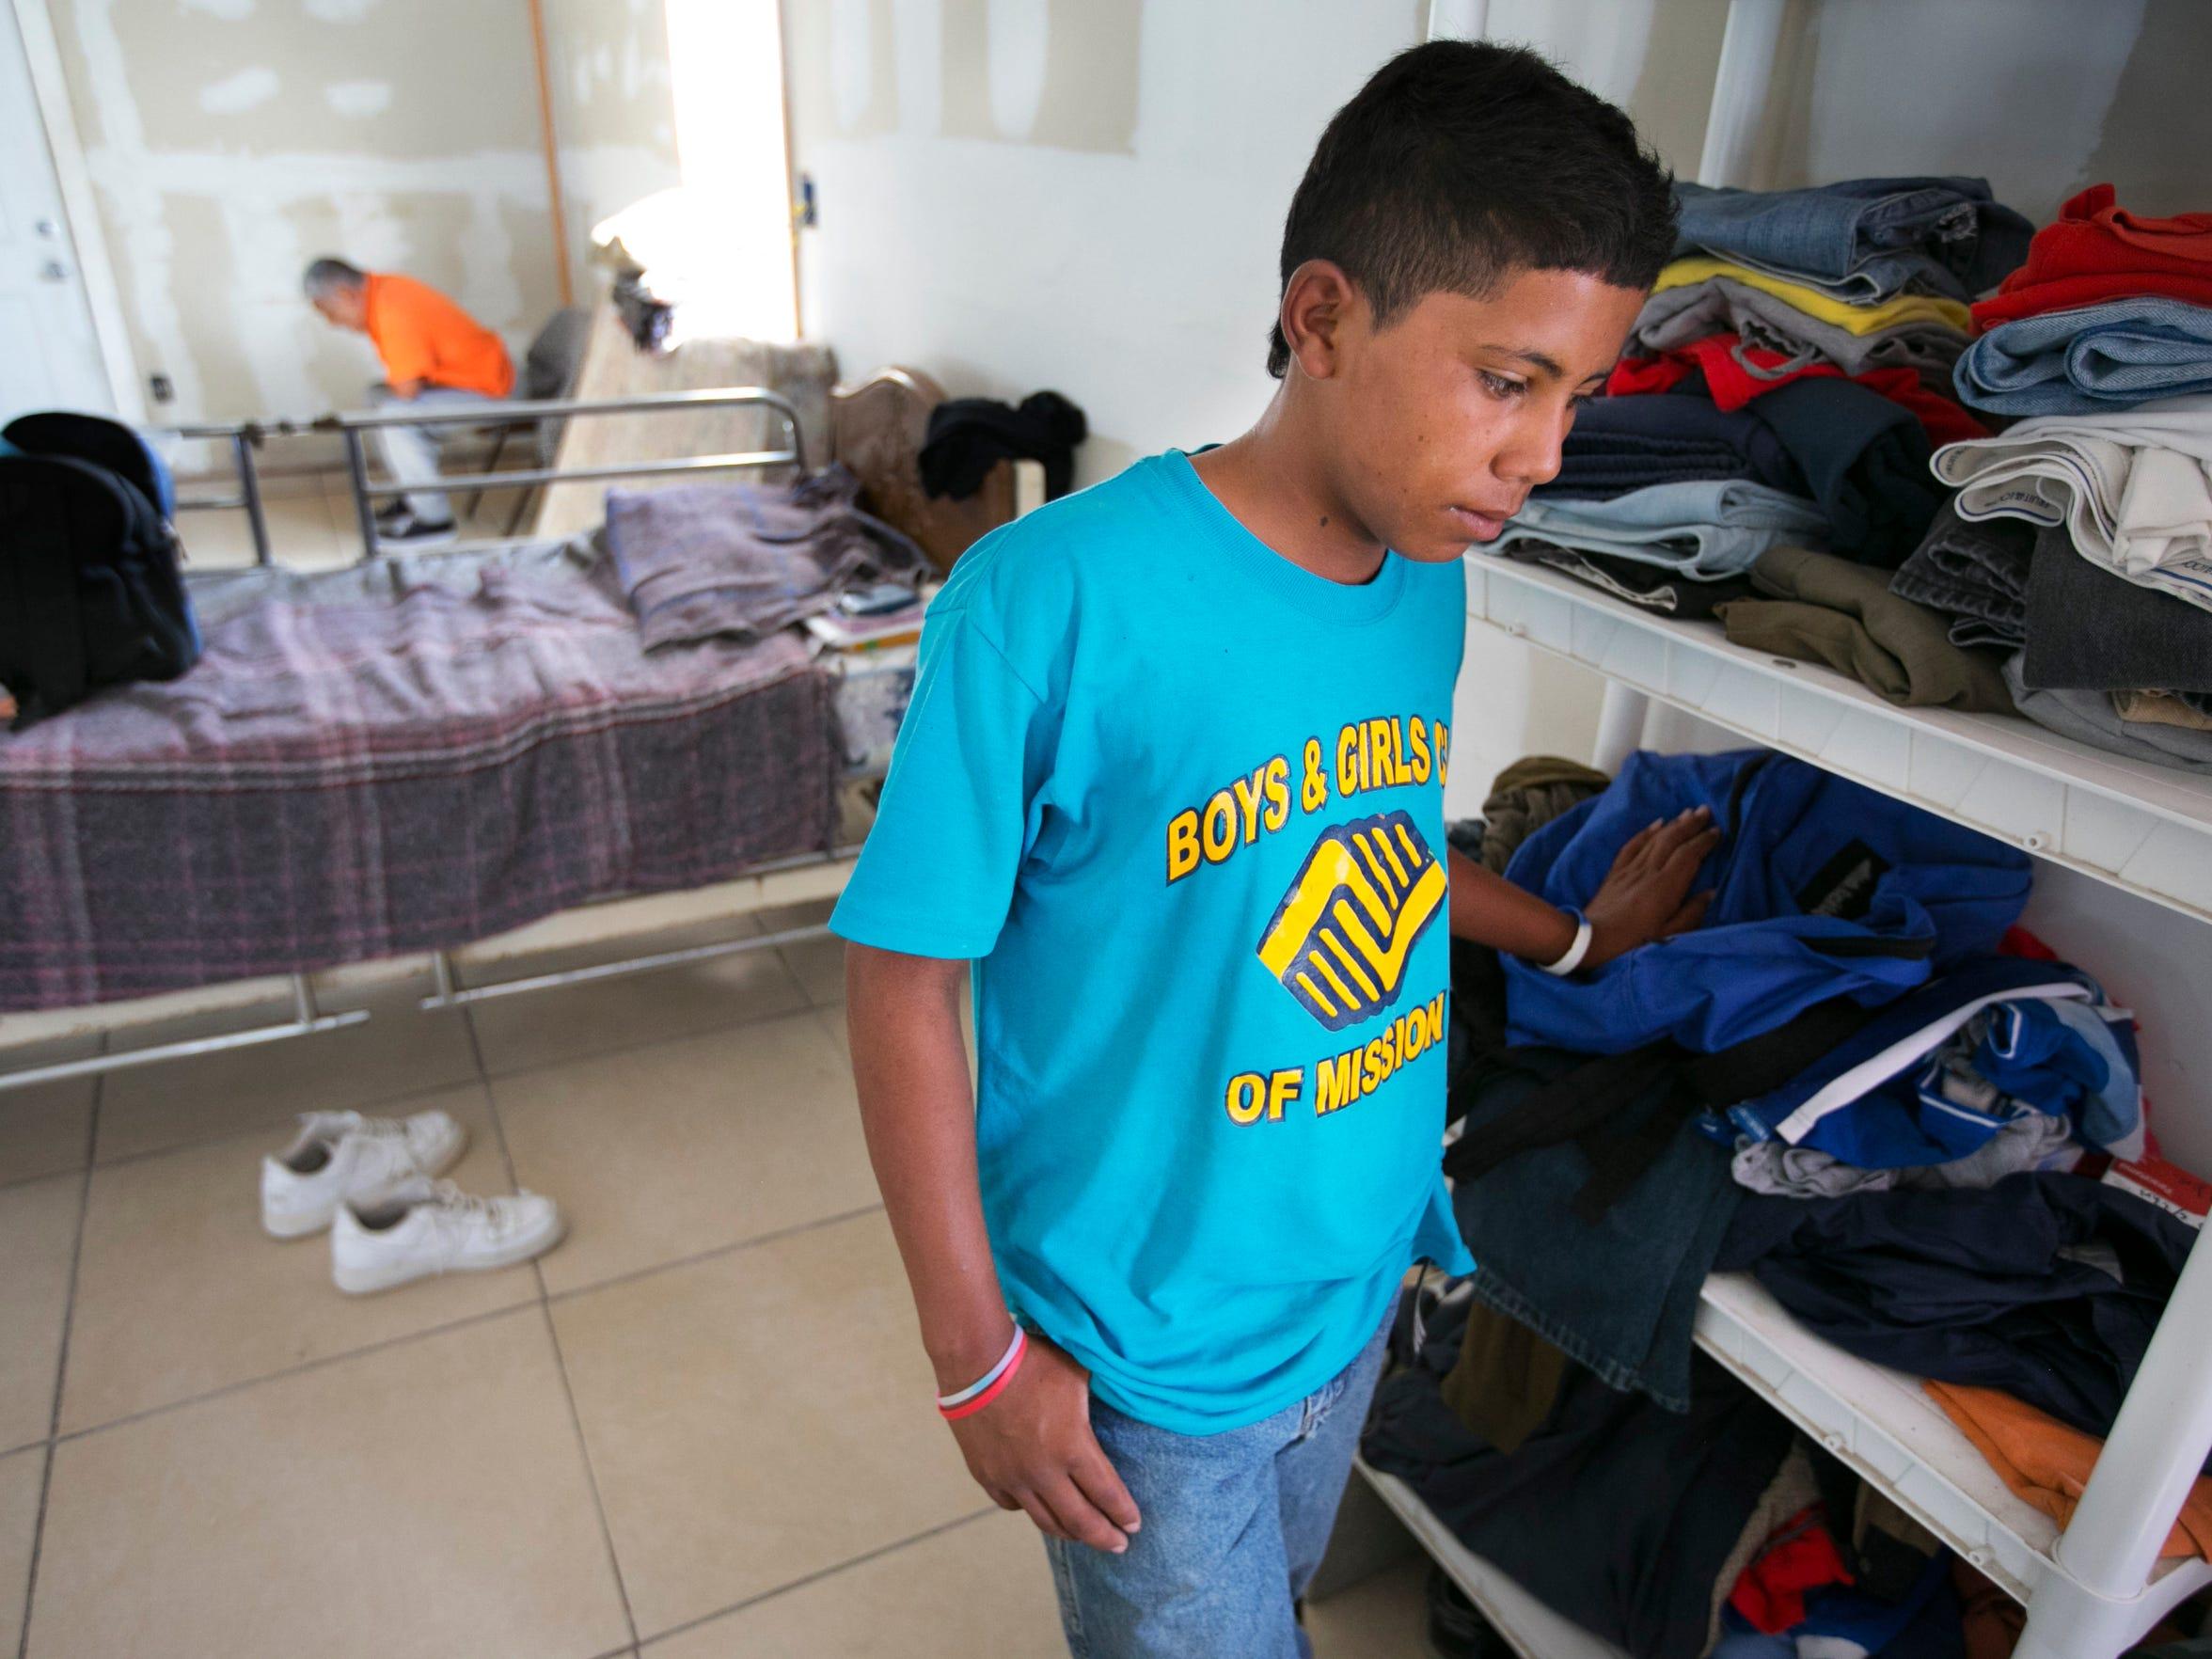 Brayan Soler Redondo, then 14, left his village of